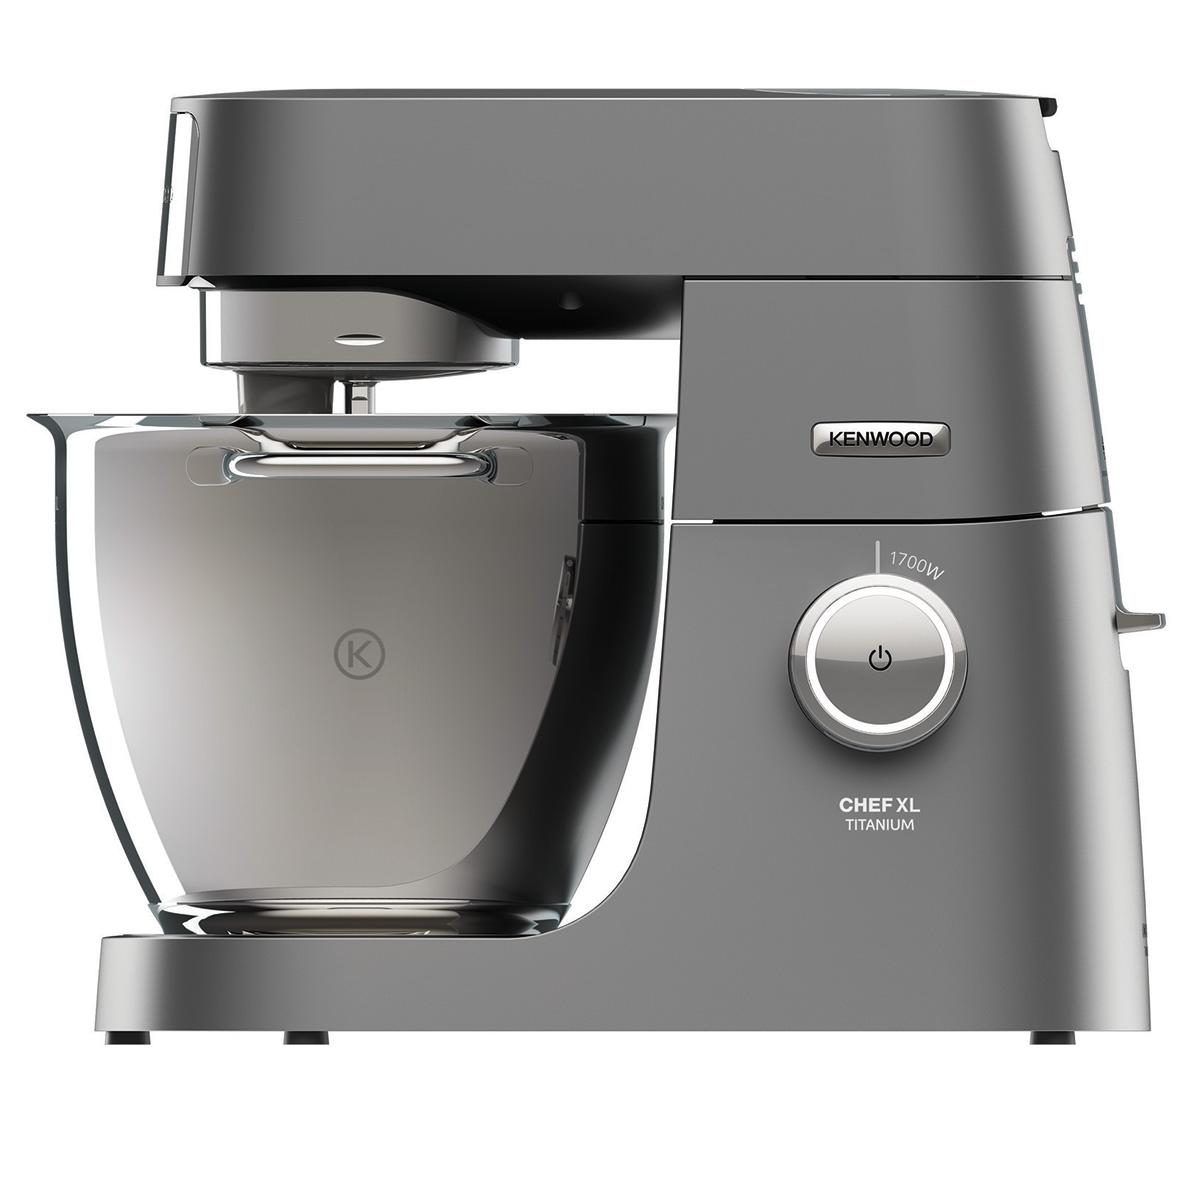 Kenwood køkkenmaskine - Chef XL Titanium - KVL8300S